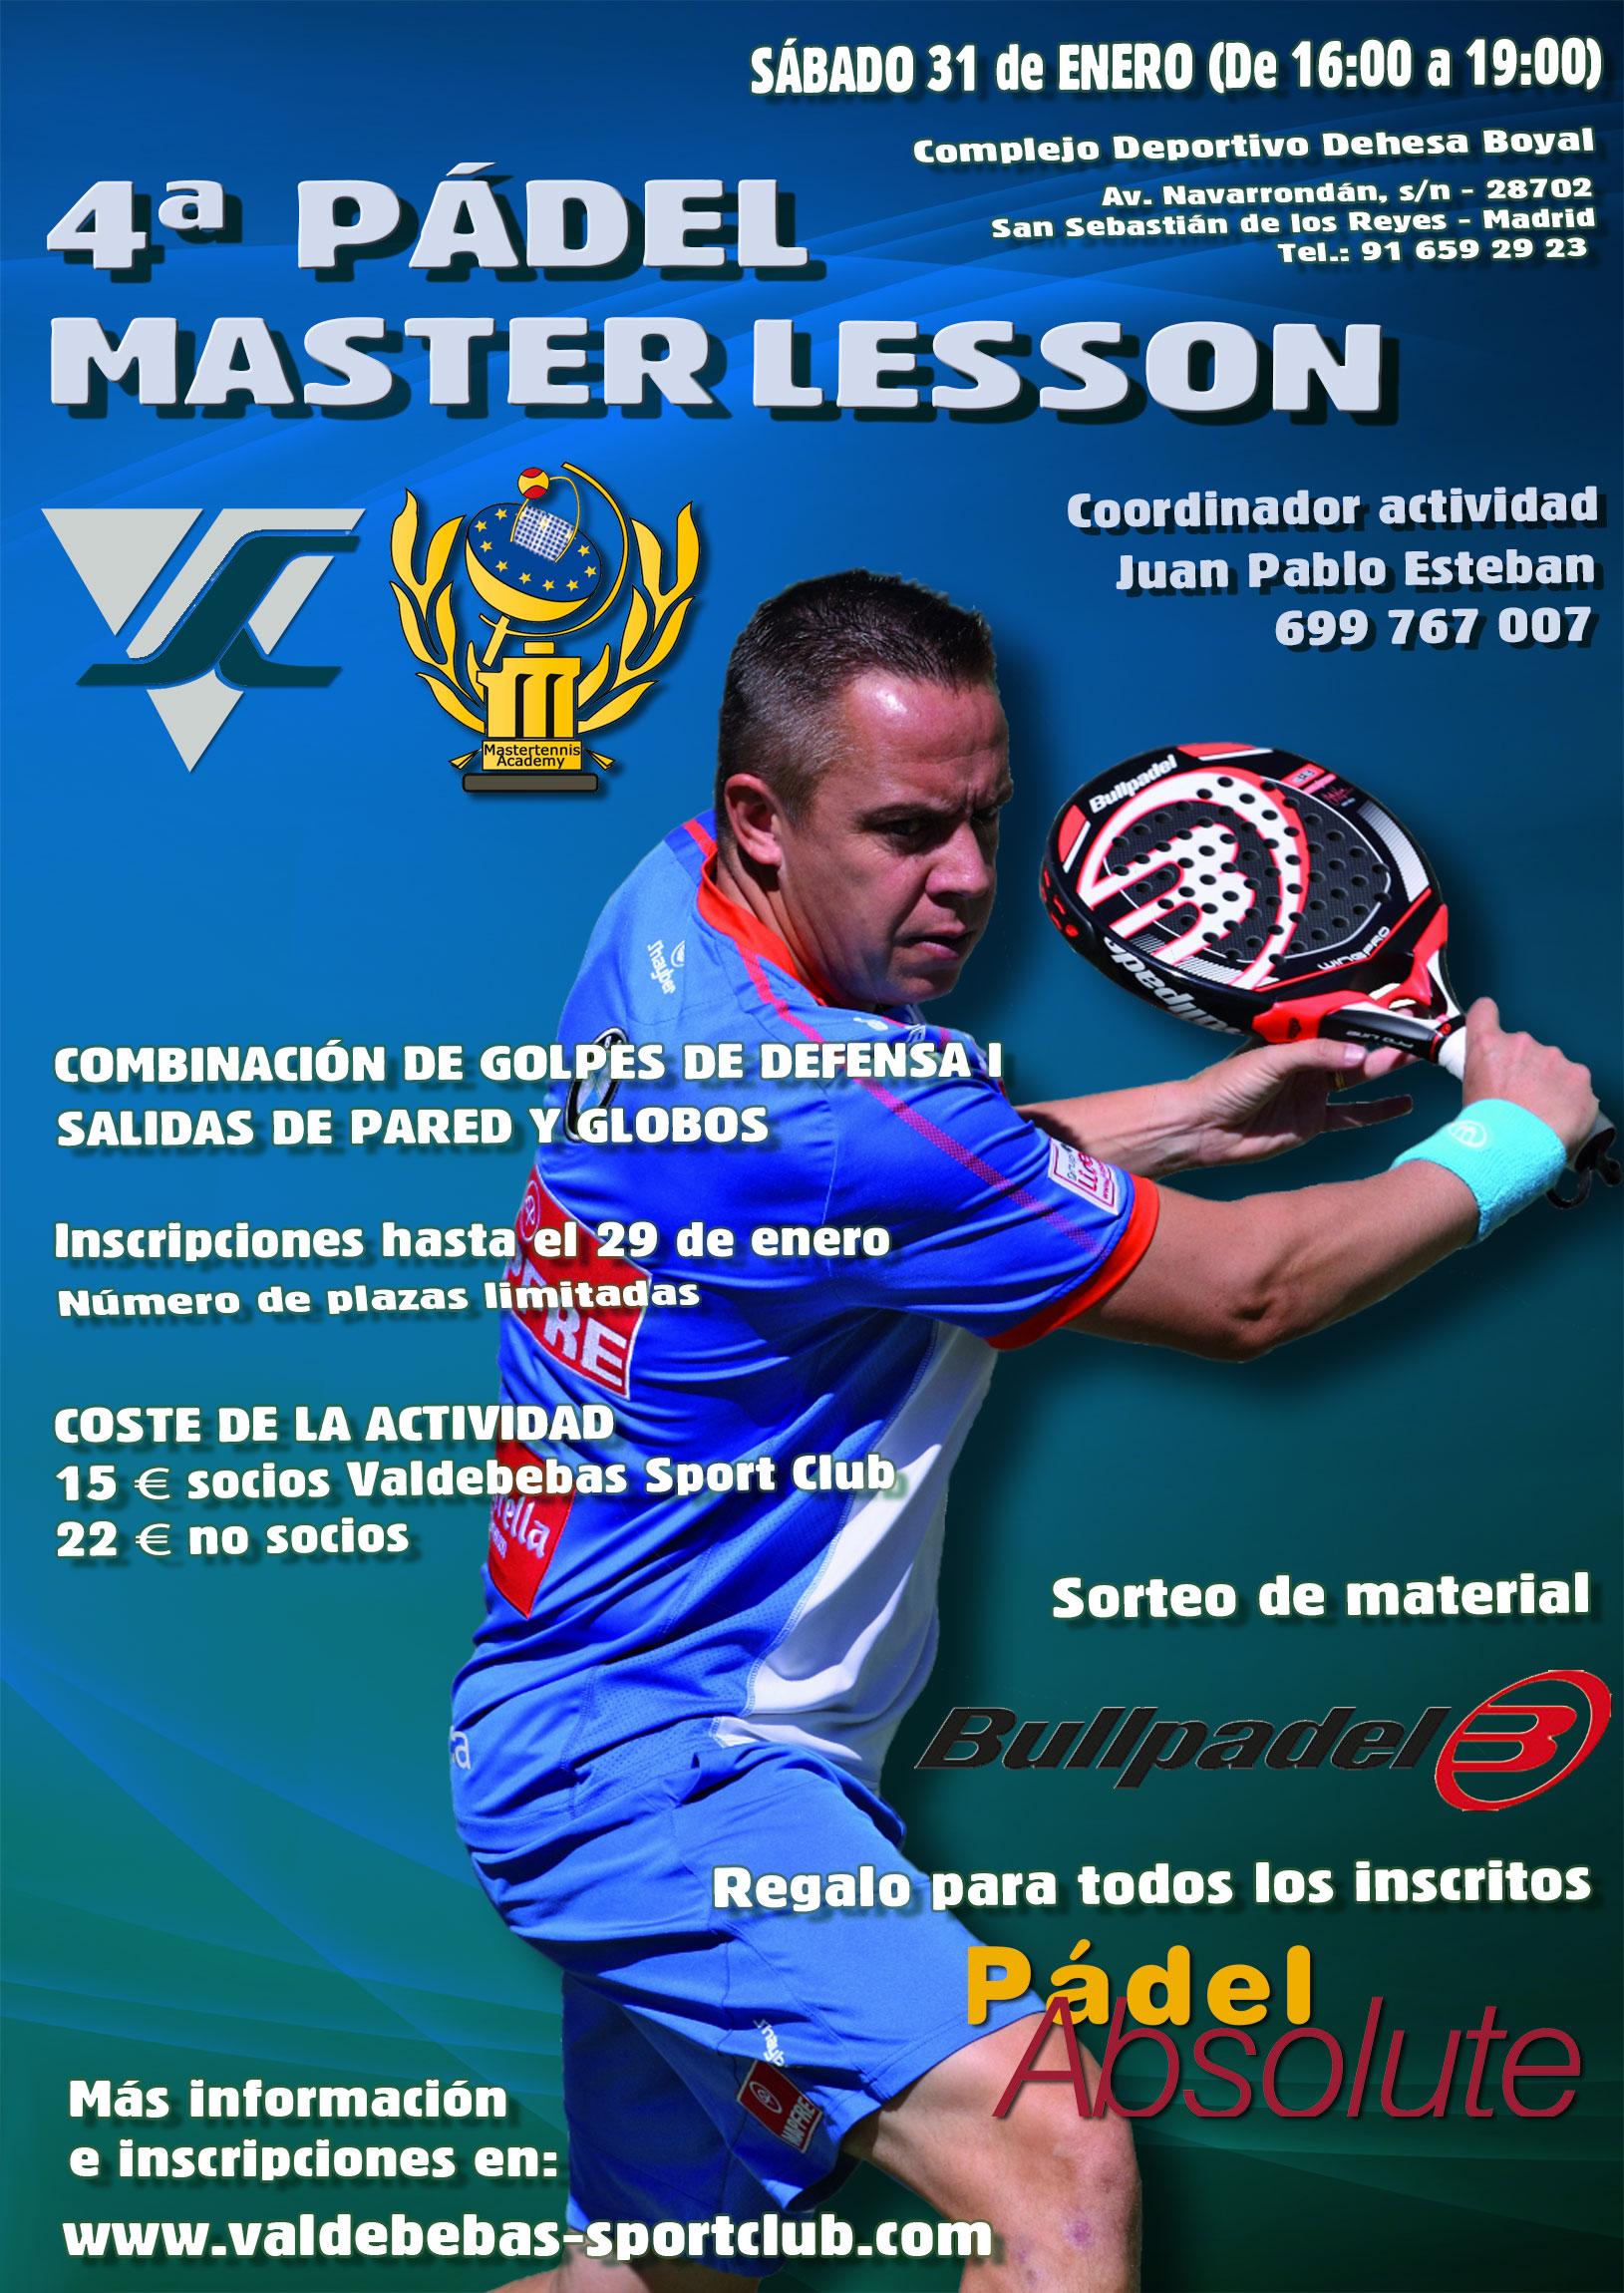 4ª-PADEL-MASTER-LESSON